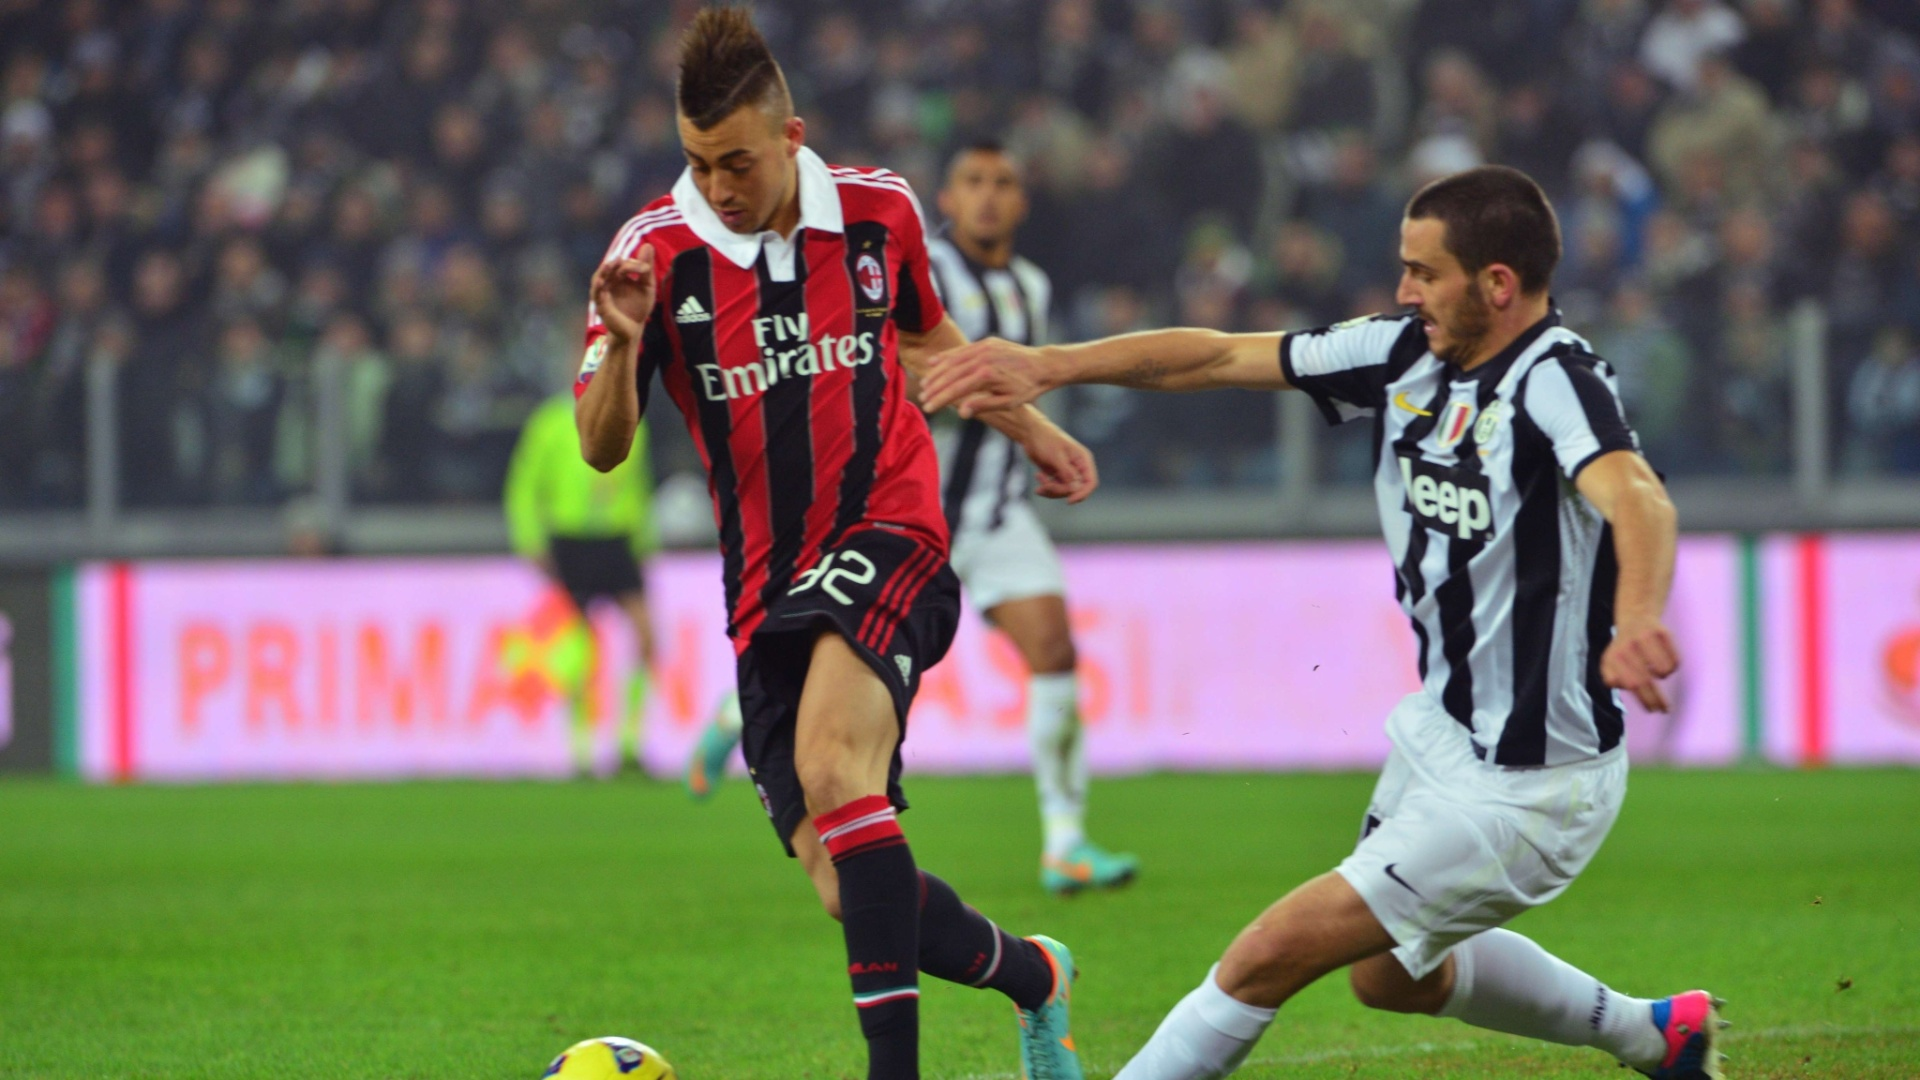 09.jan.2013 - Stephan El Shaarawy, do Milan, recebe o combate de Leonardo Bonucci, da Juventus